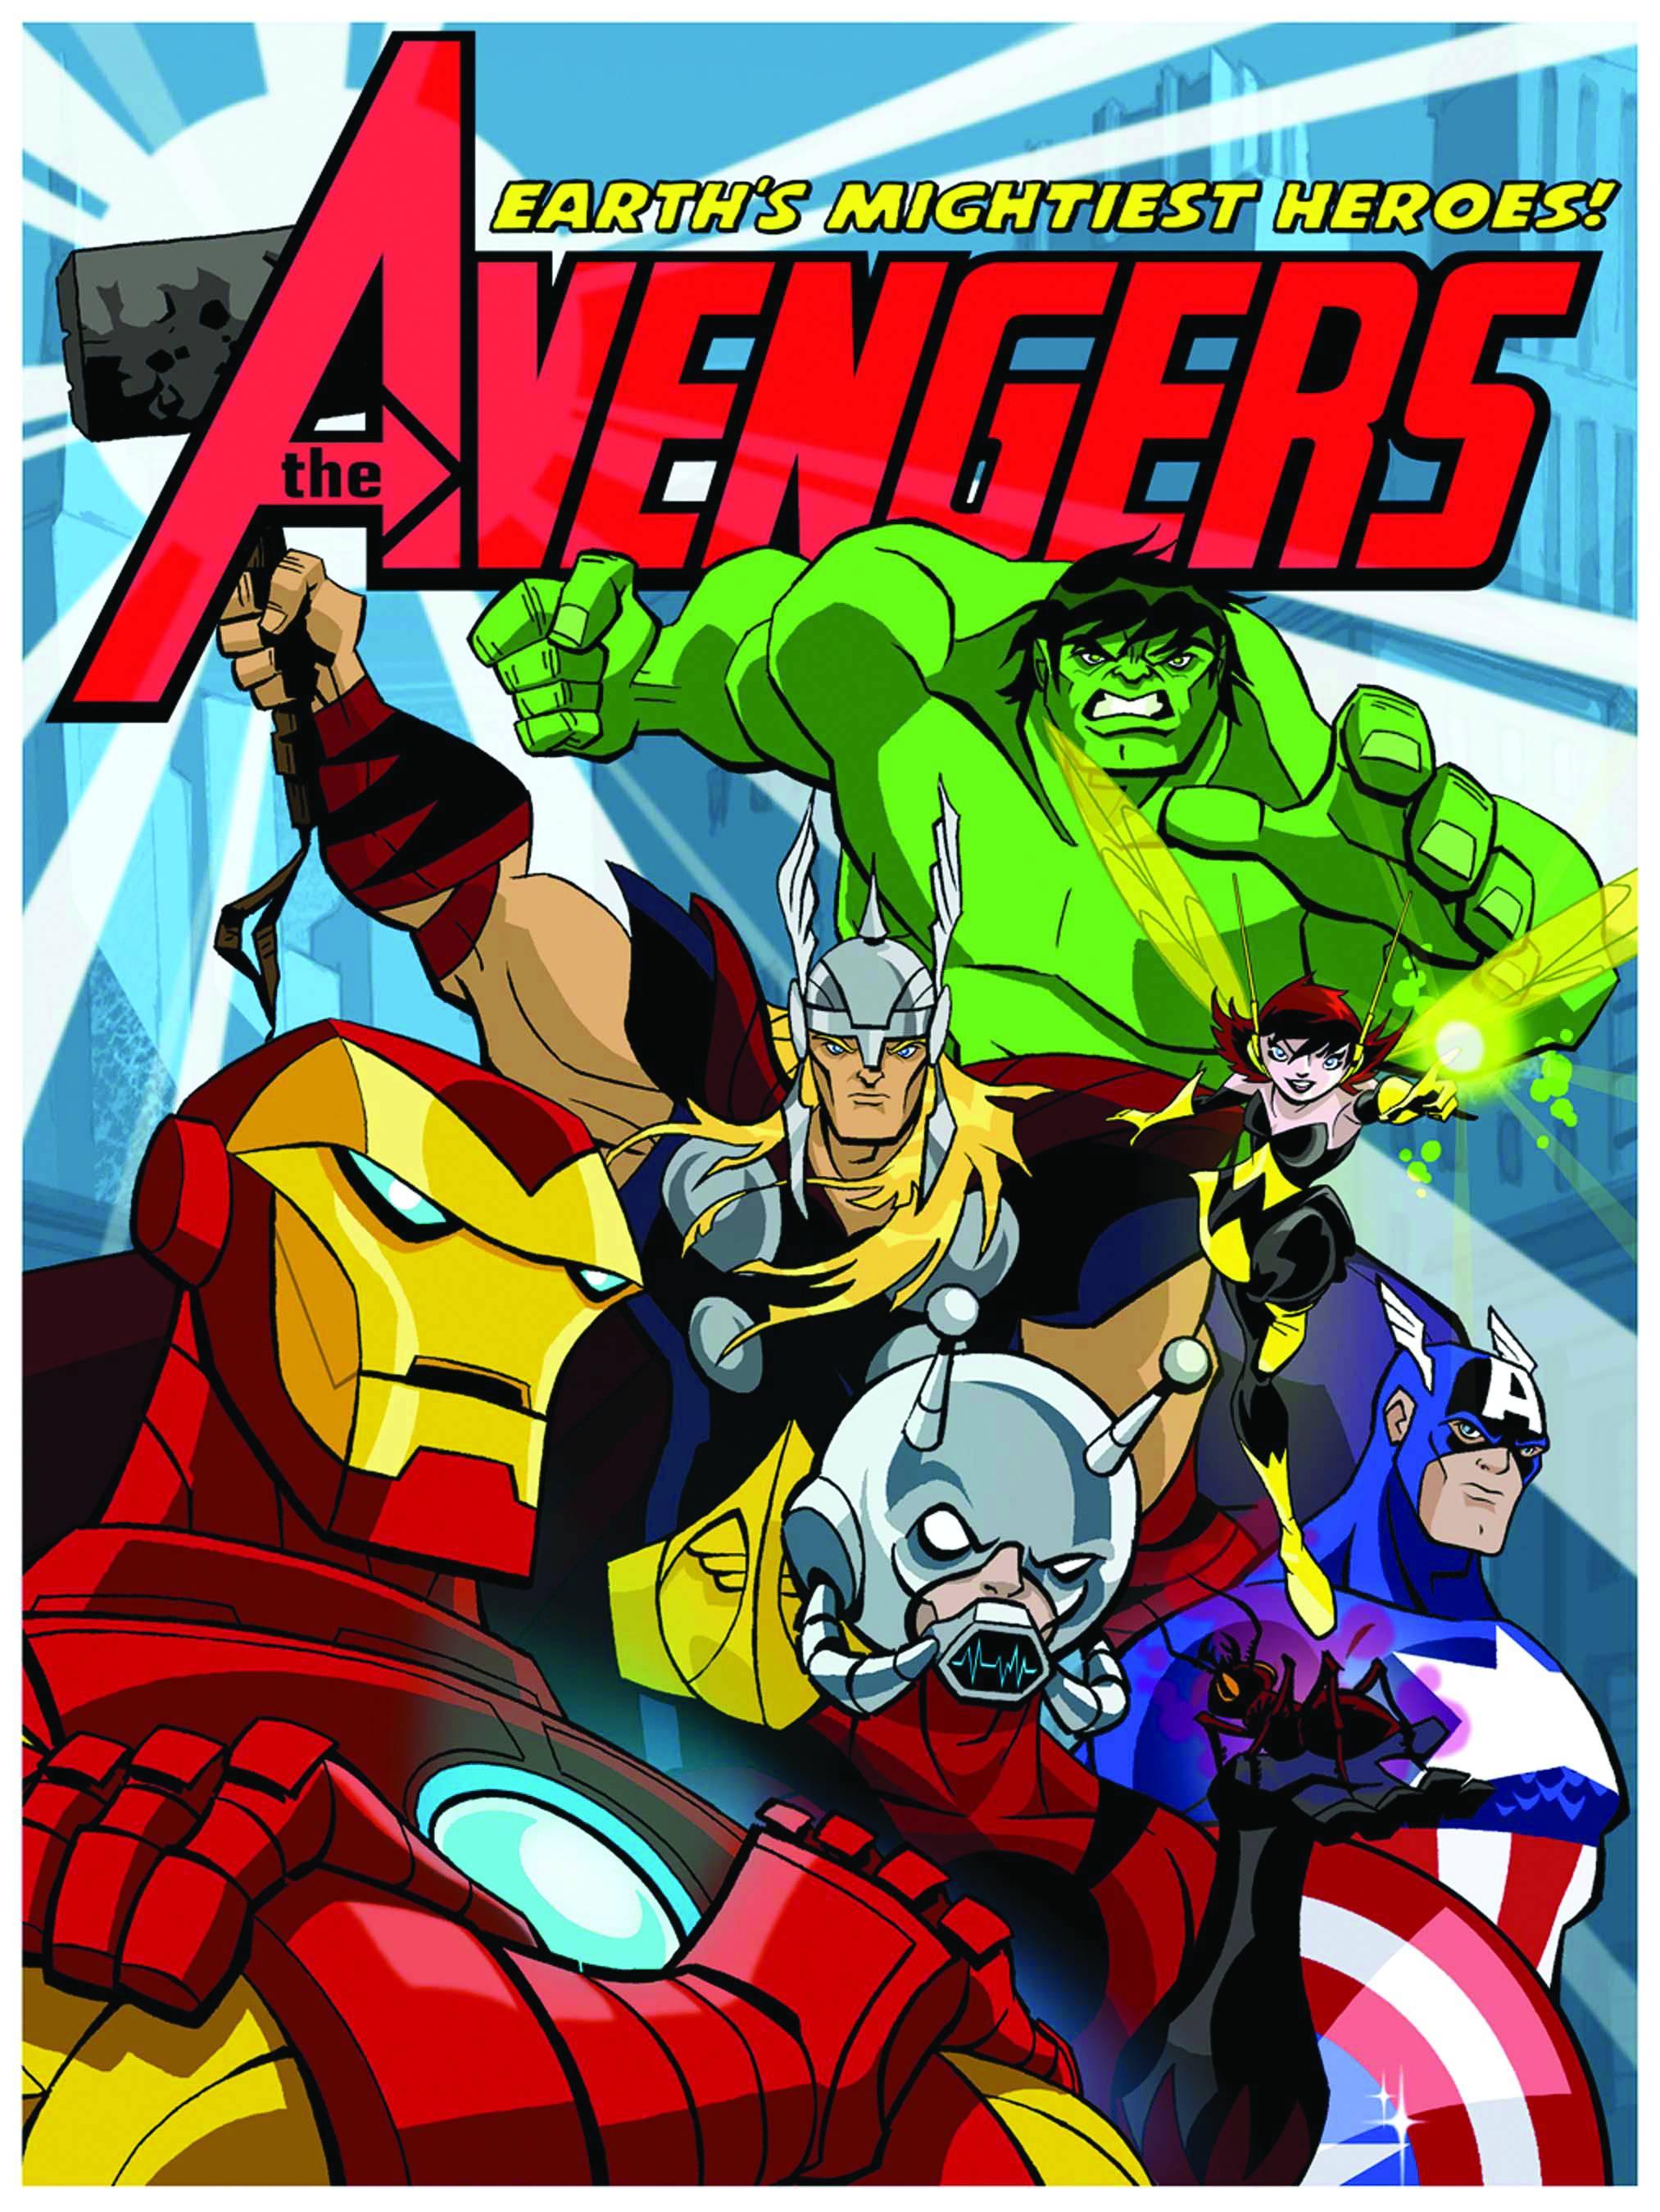 Avengers_Earth's_Mightiest_Heroes_Vol_3_2_Textless